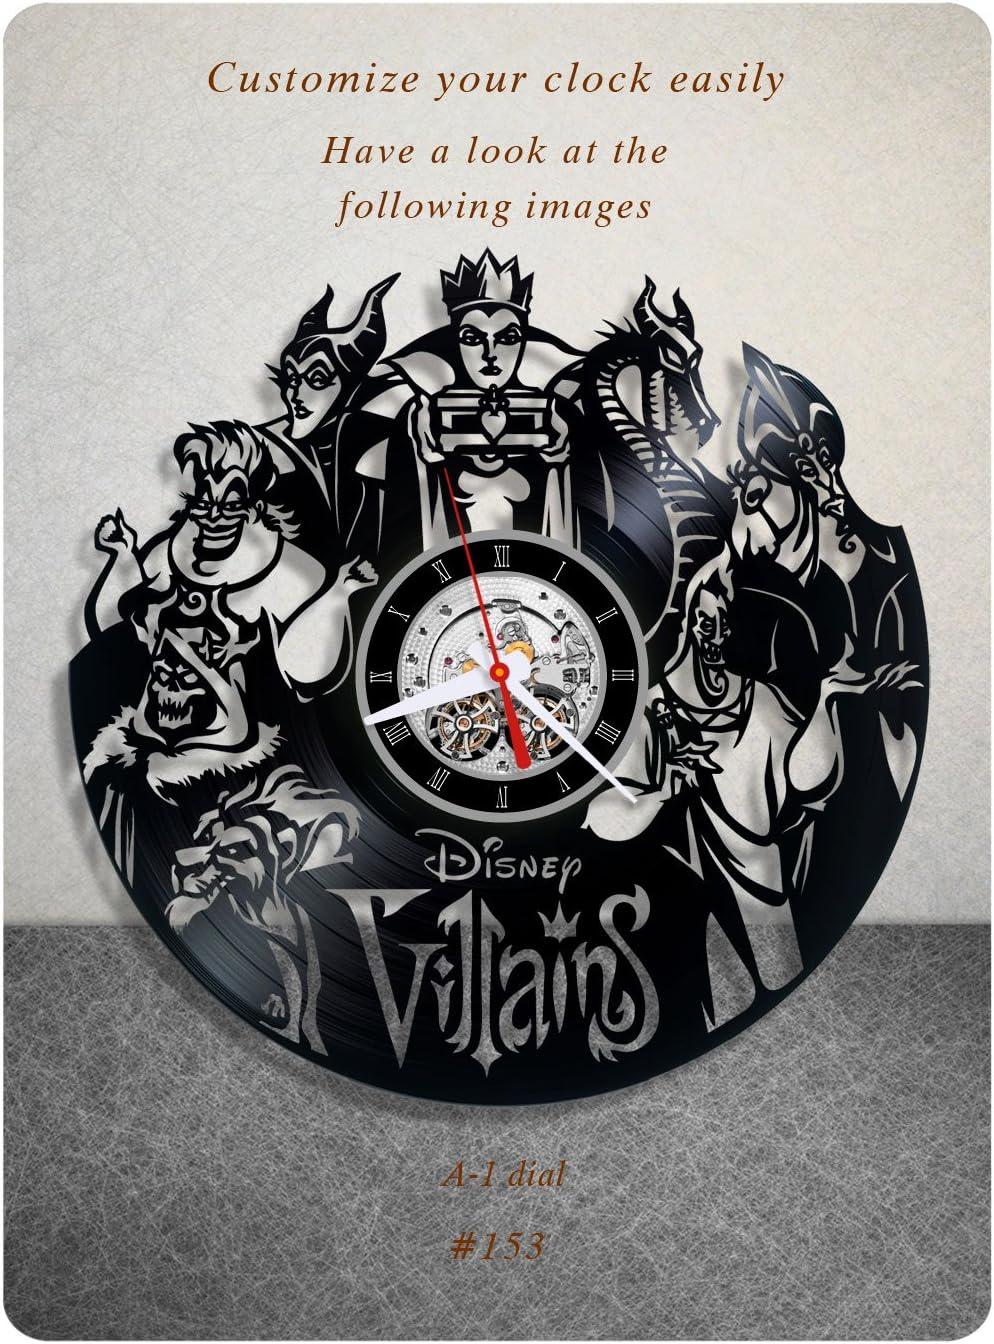 Disney Villains Vinyl Clock, Vinyl Wall Clock, Vinyl Record Clock, Walt Disney Clock Maleficent The Evil Queen Jafar Captain Hook Scar Gaston Wall Art Home Decor Kids Gift 153 - (a1)